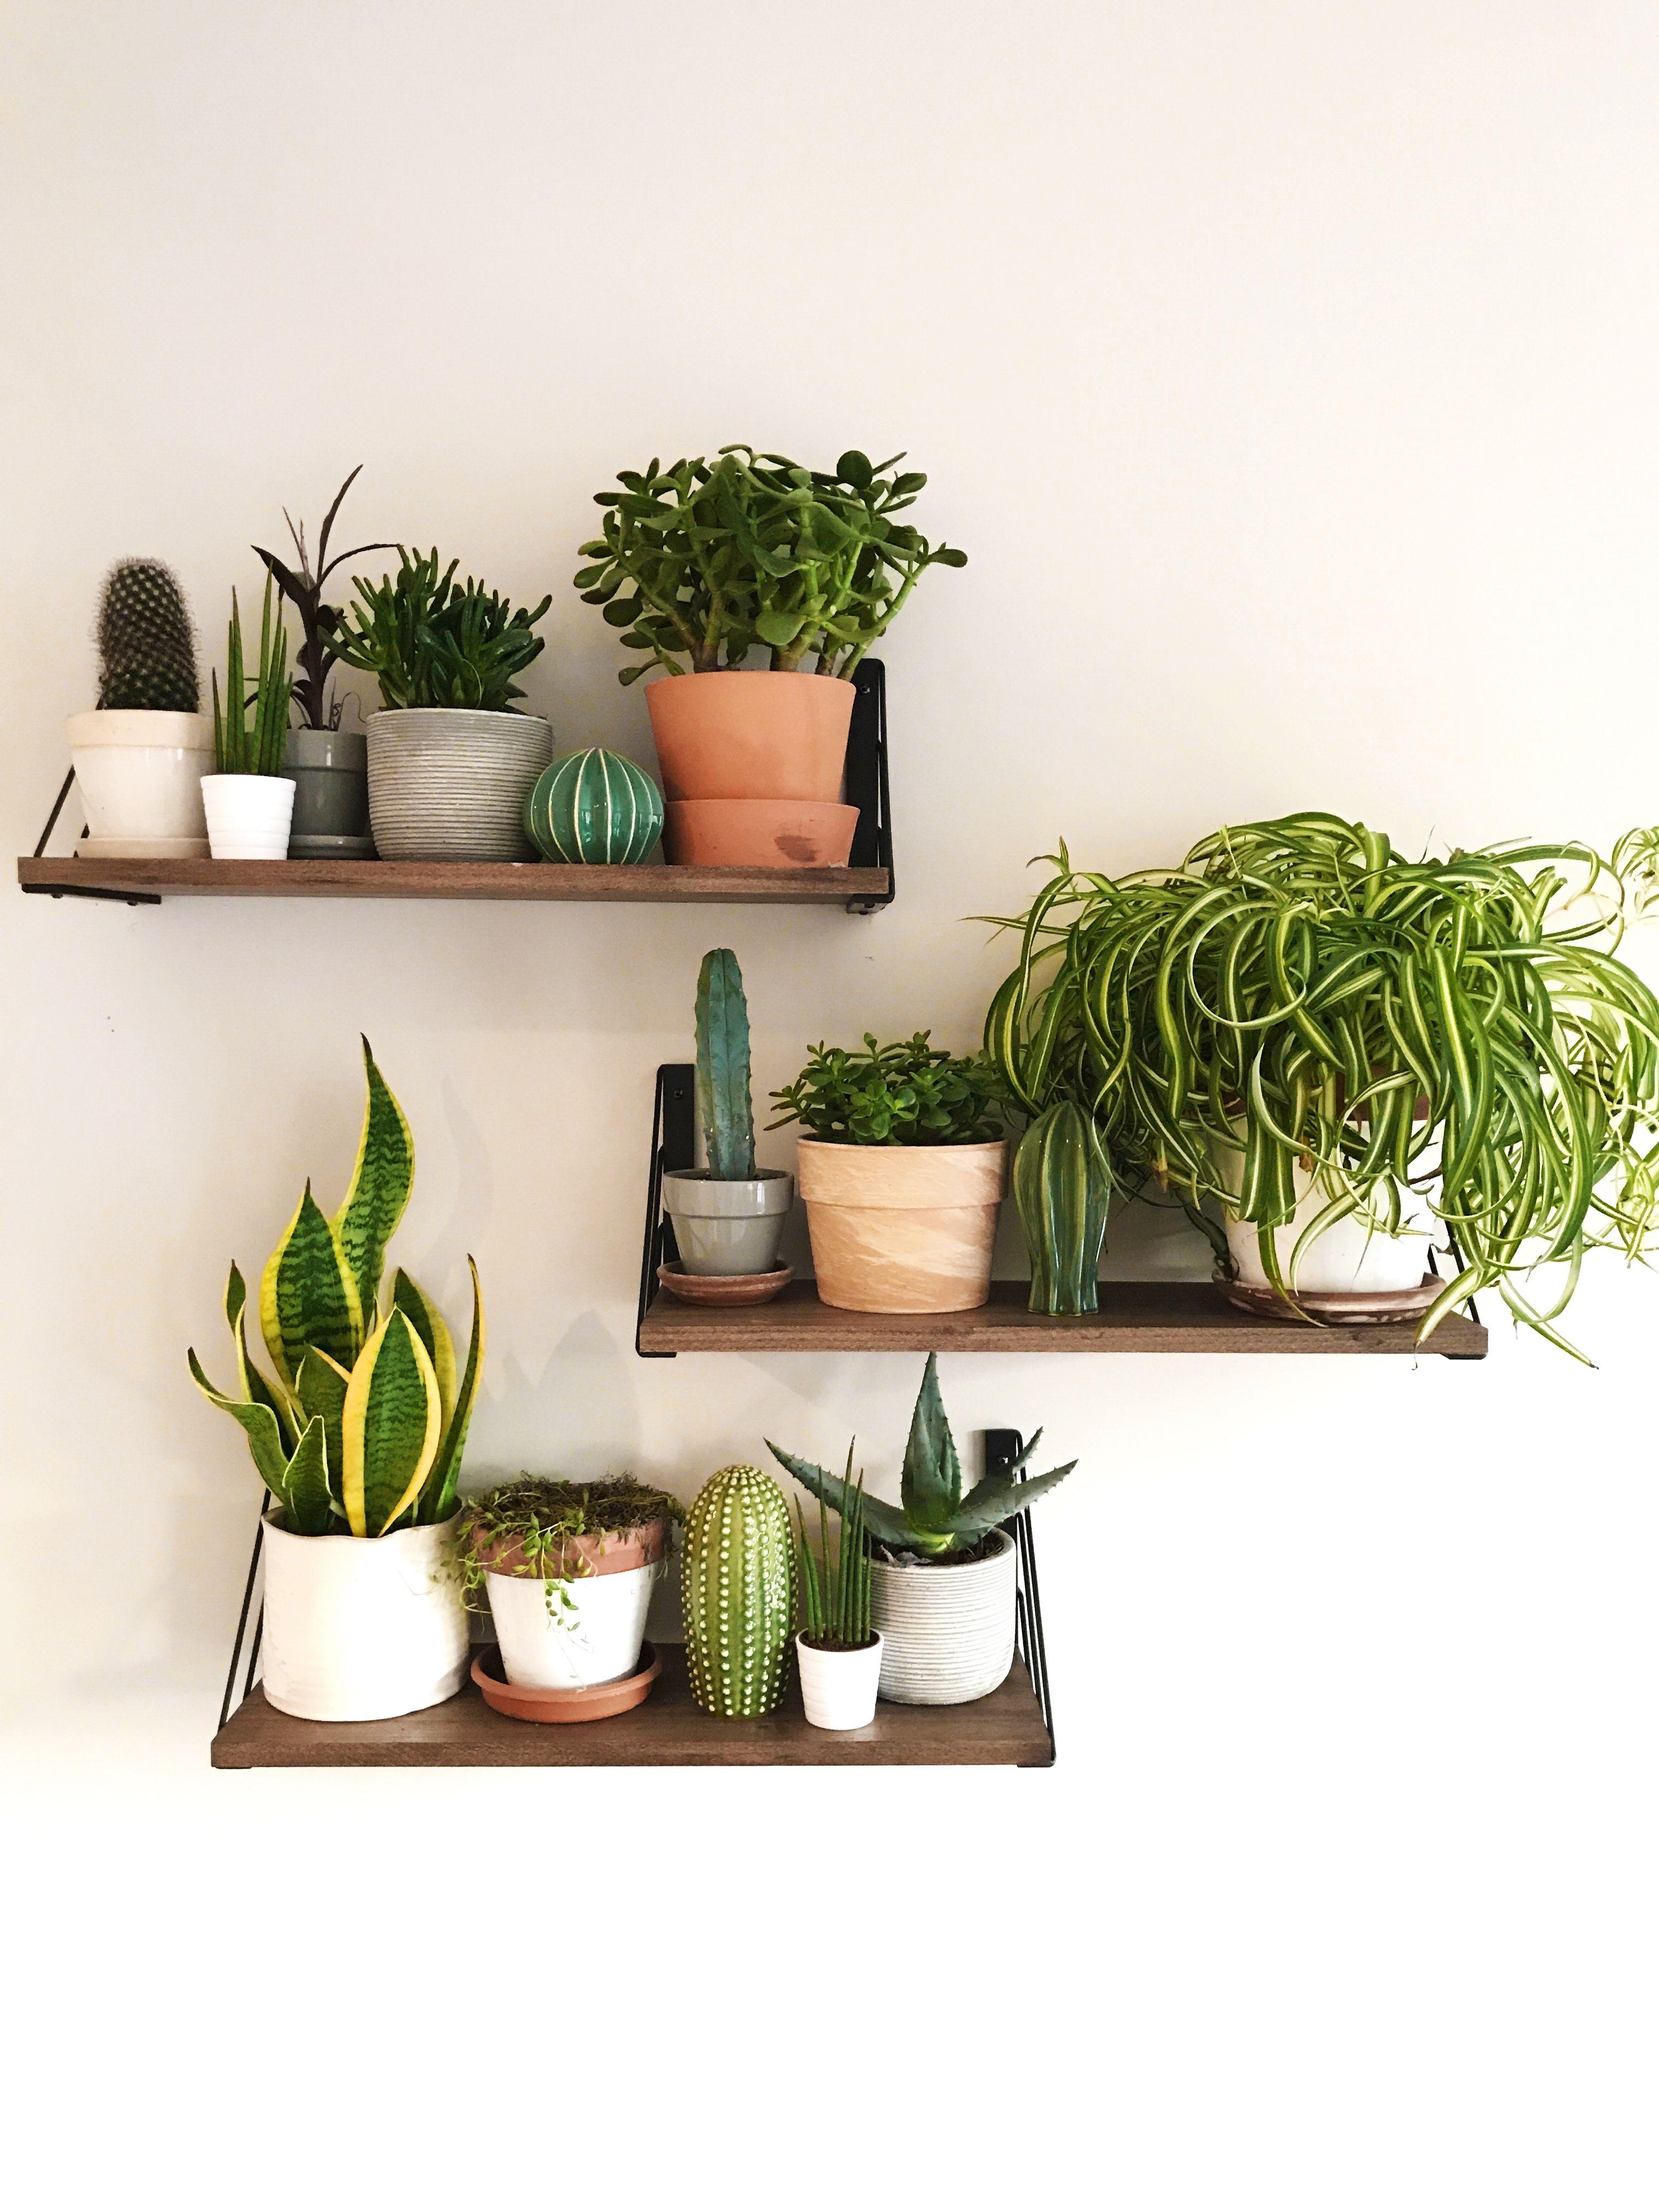 Cactus Cacti Plant Succulent Aesthetic Greenery Room Inspo Inspiration Roominspo Greenthumb Plant Decor Indoor Plant Decor House Plants Decor